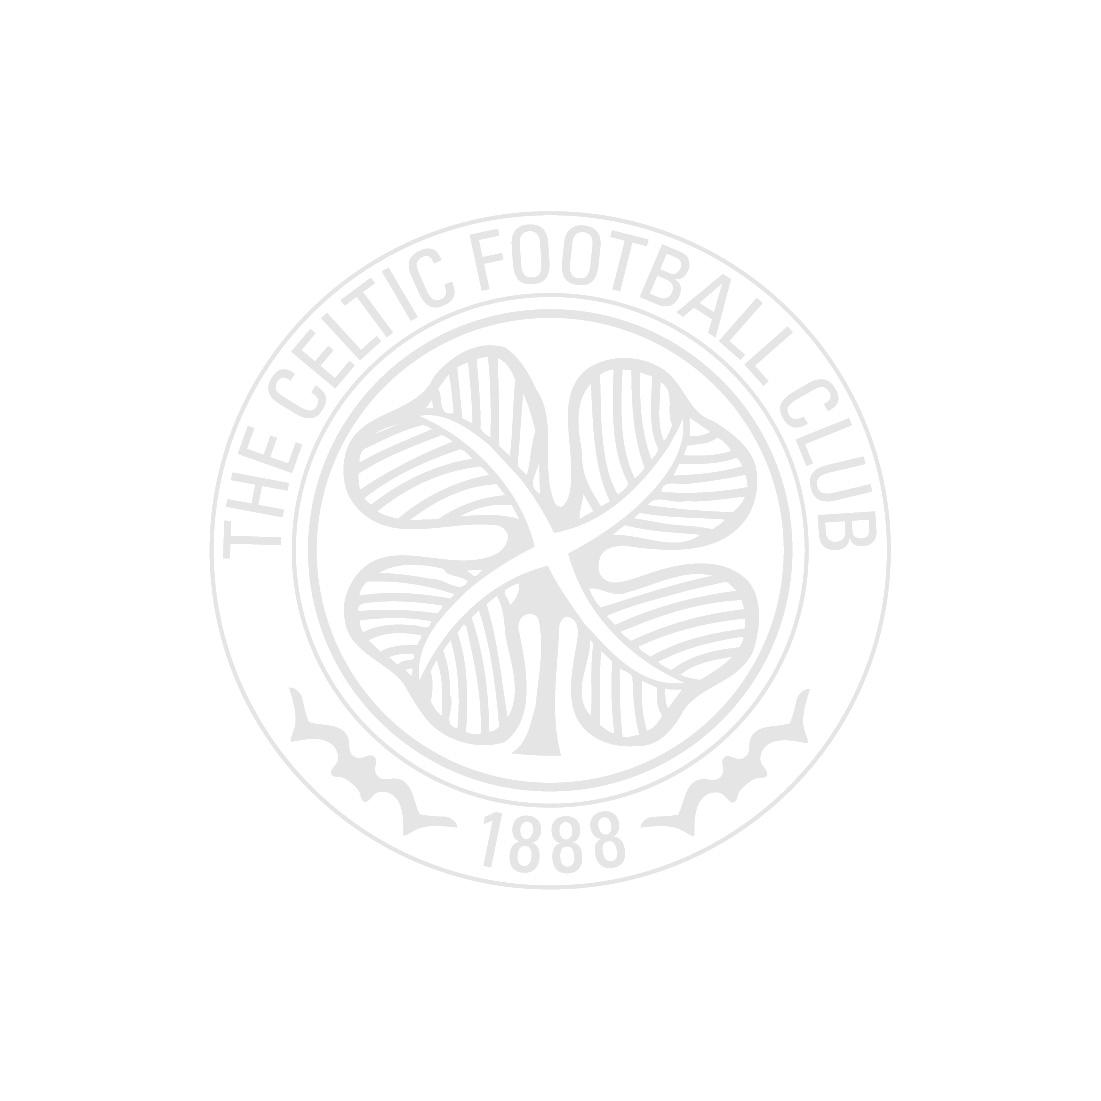 Celtic Ready2Music Headphones